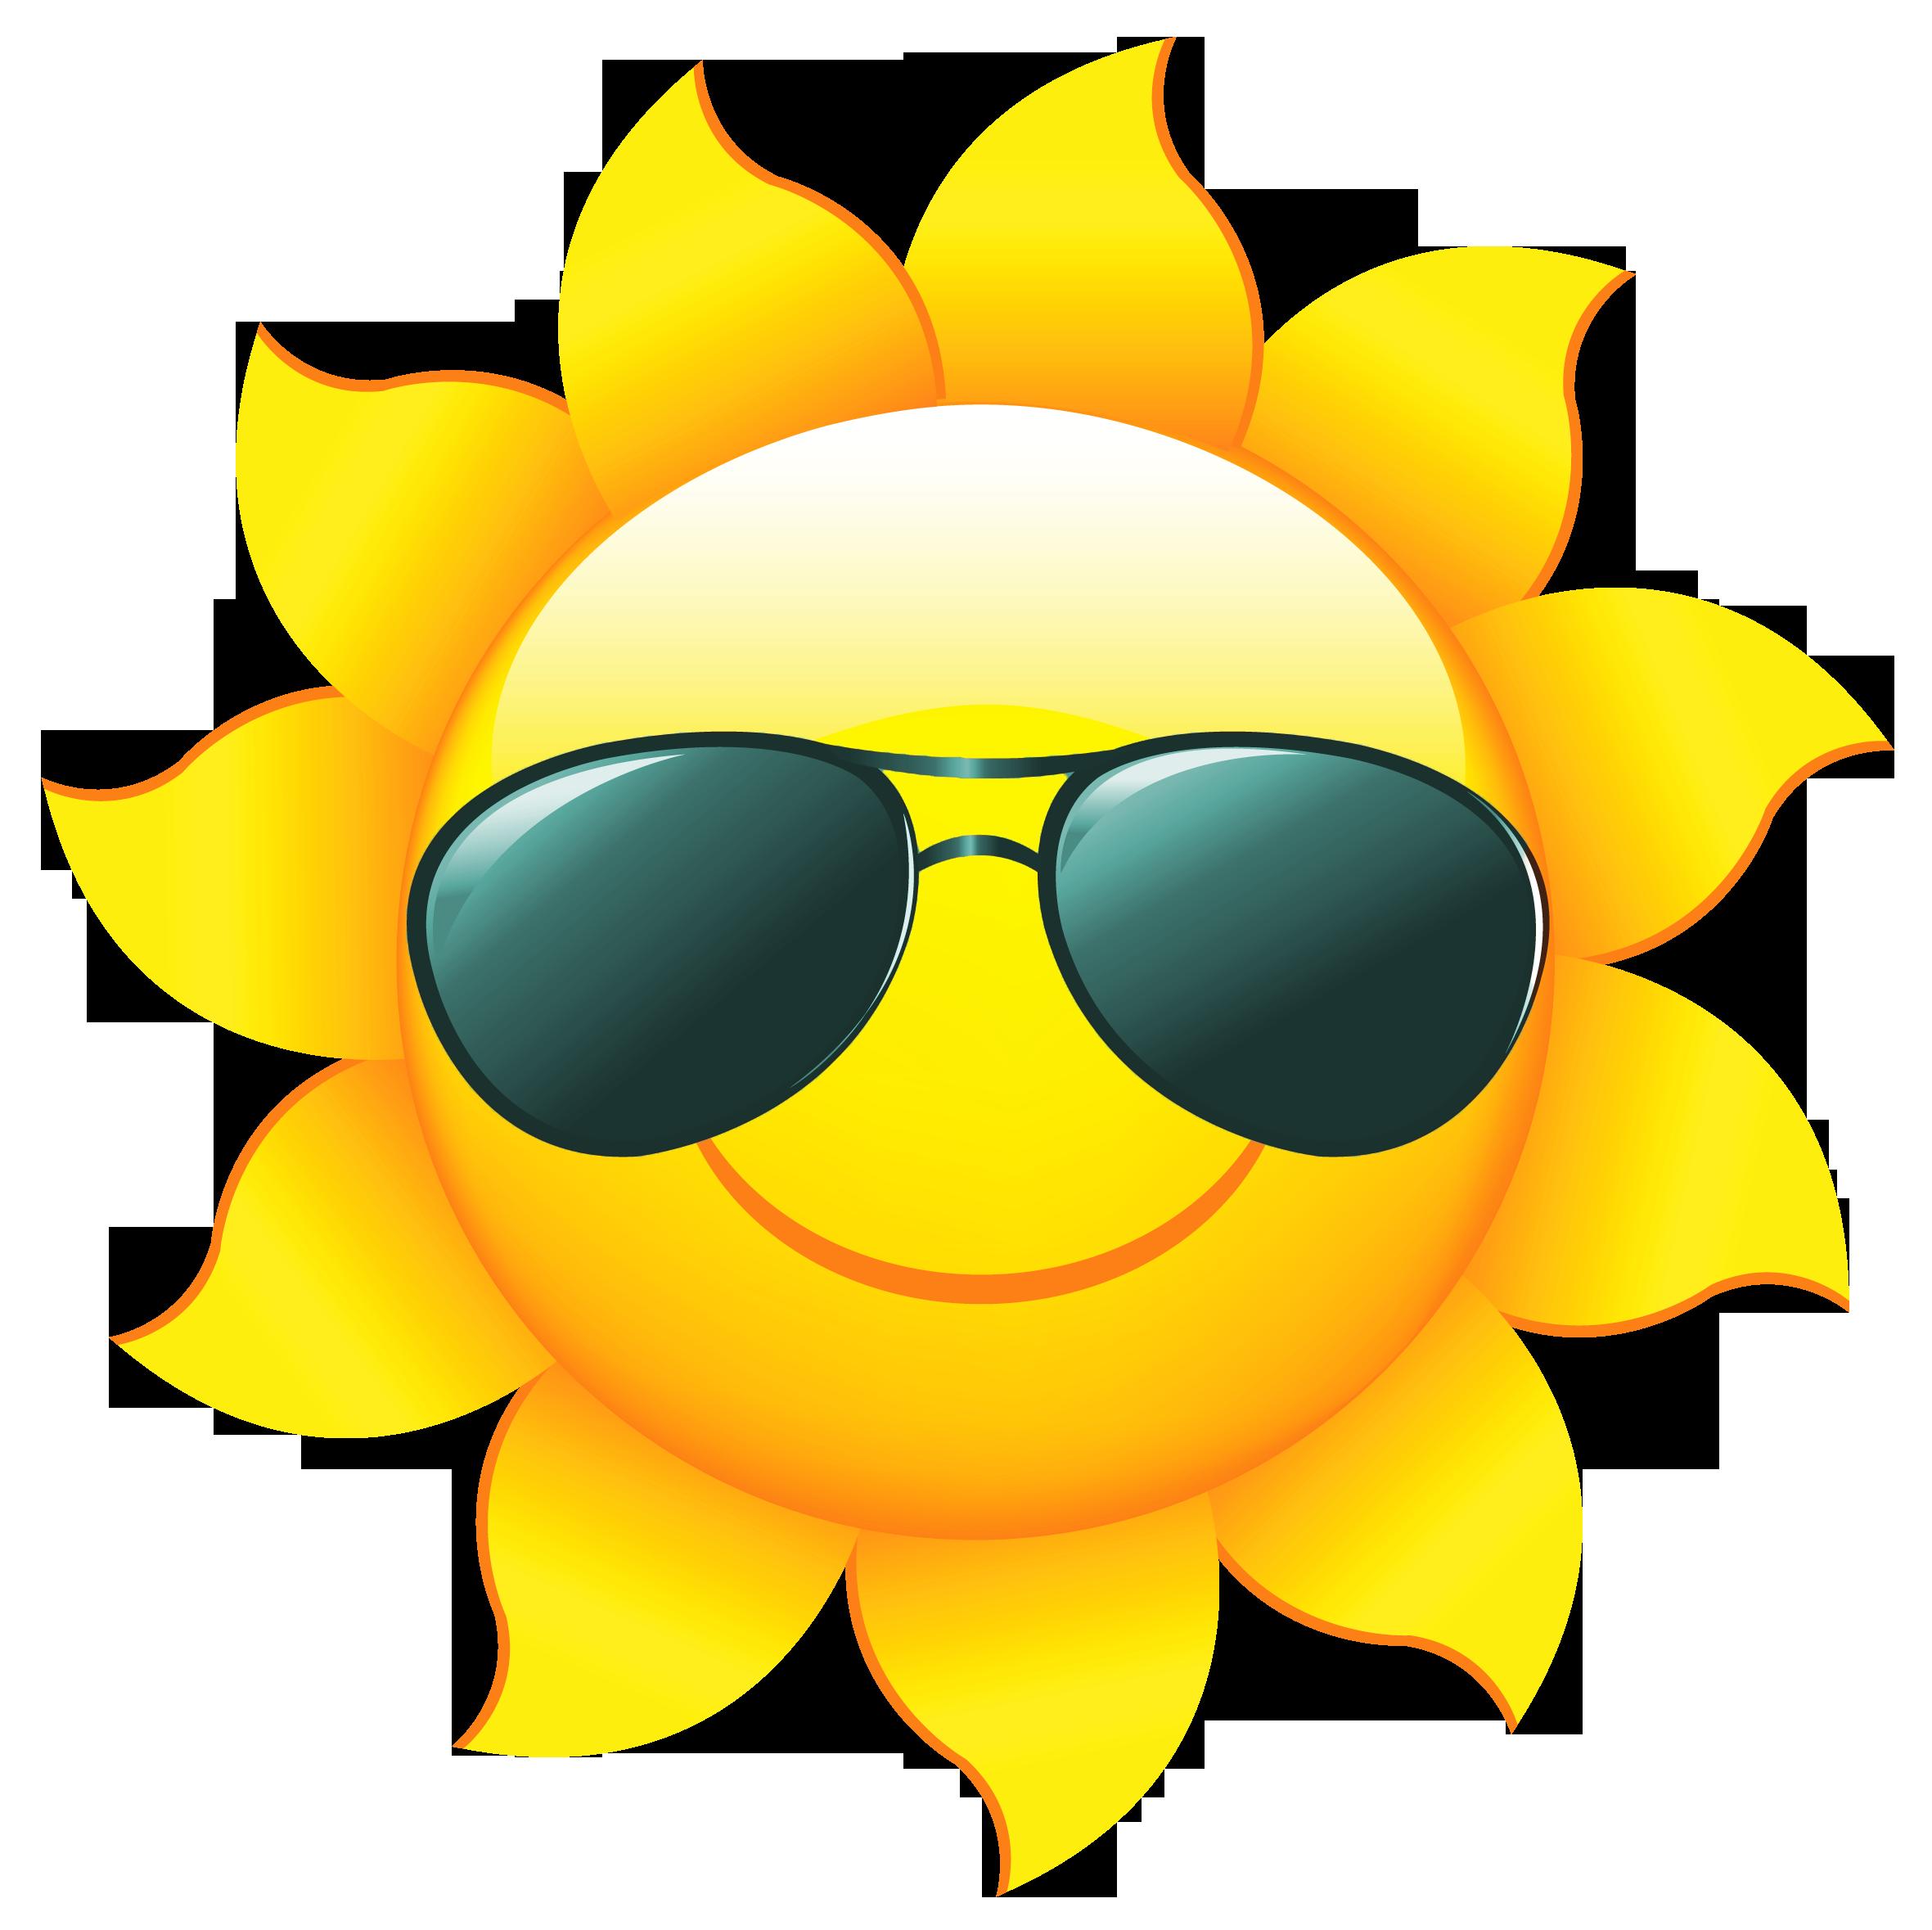 Sunshine Sun Clip Art With Transparent B-Sunshine sun clip art with transparent background free-15